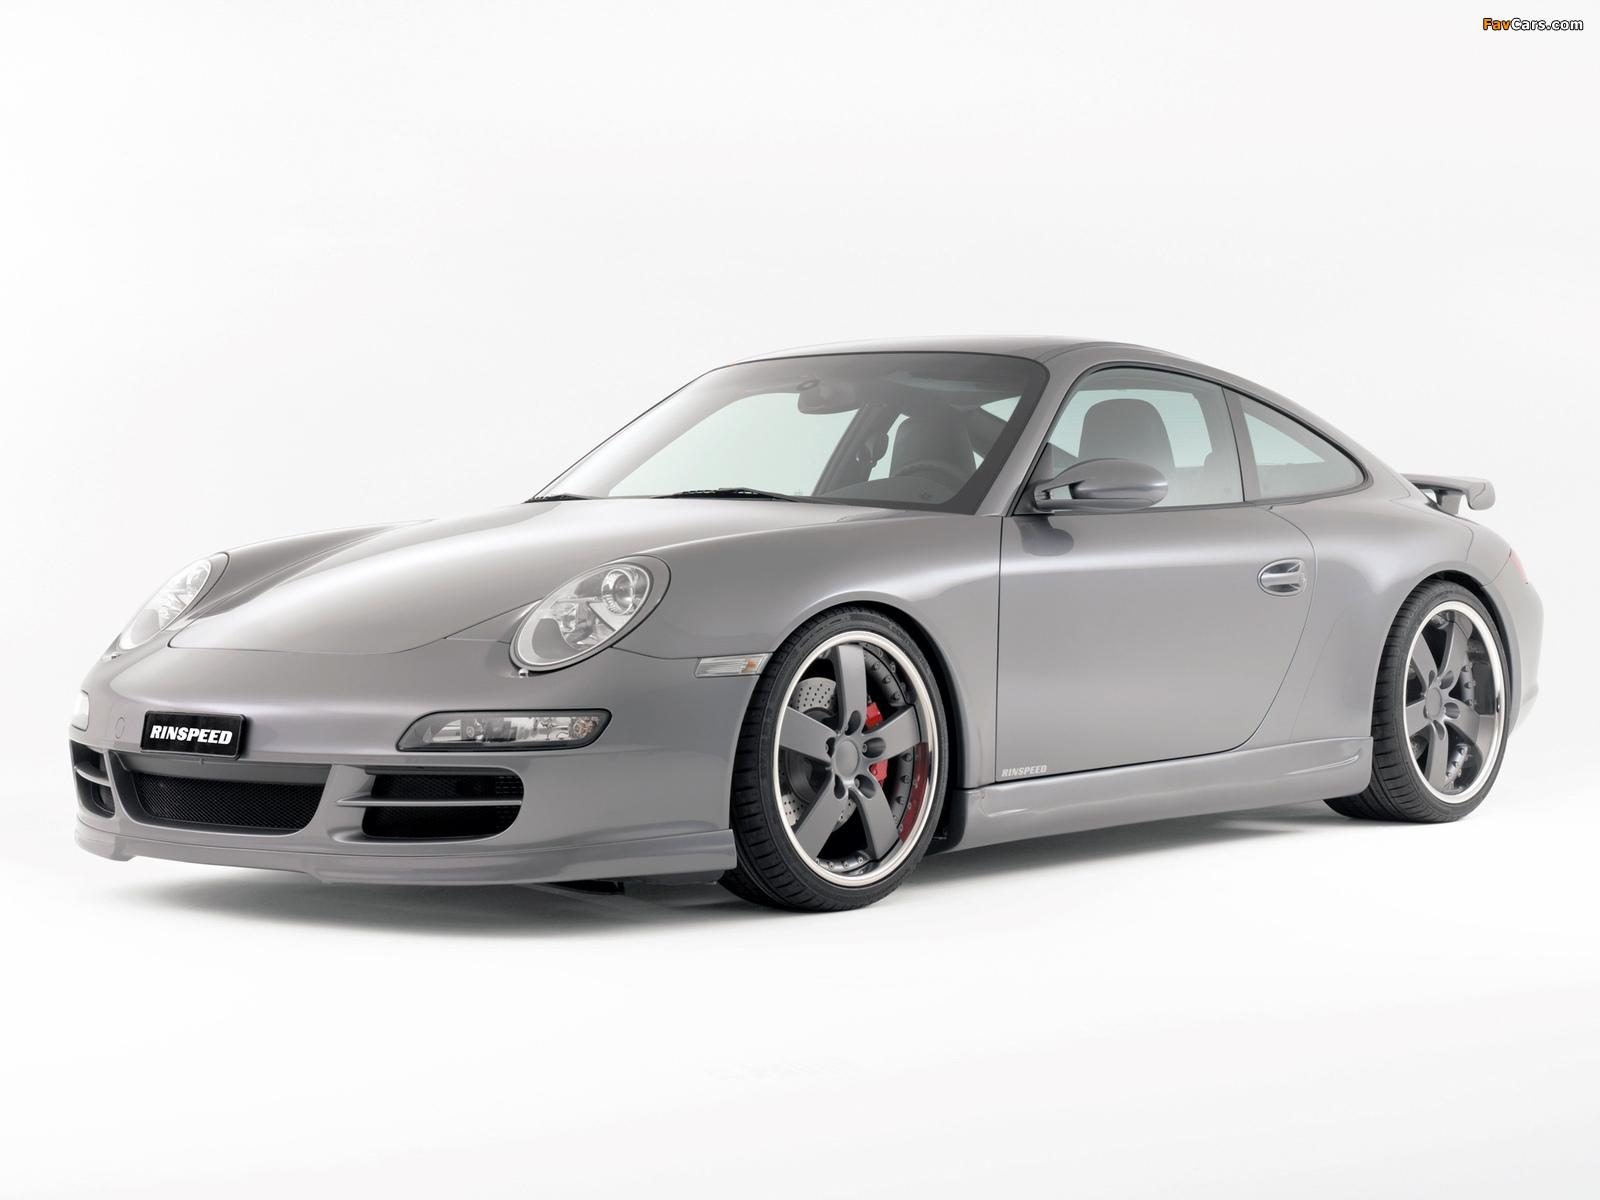 Rinspeed Porsche 911 Carrera Coupe (997) wallpapers (1600 x 1200)